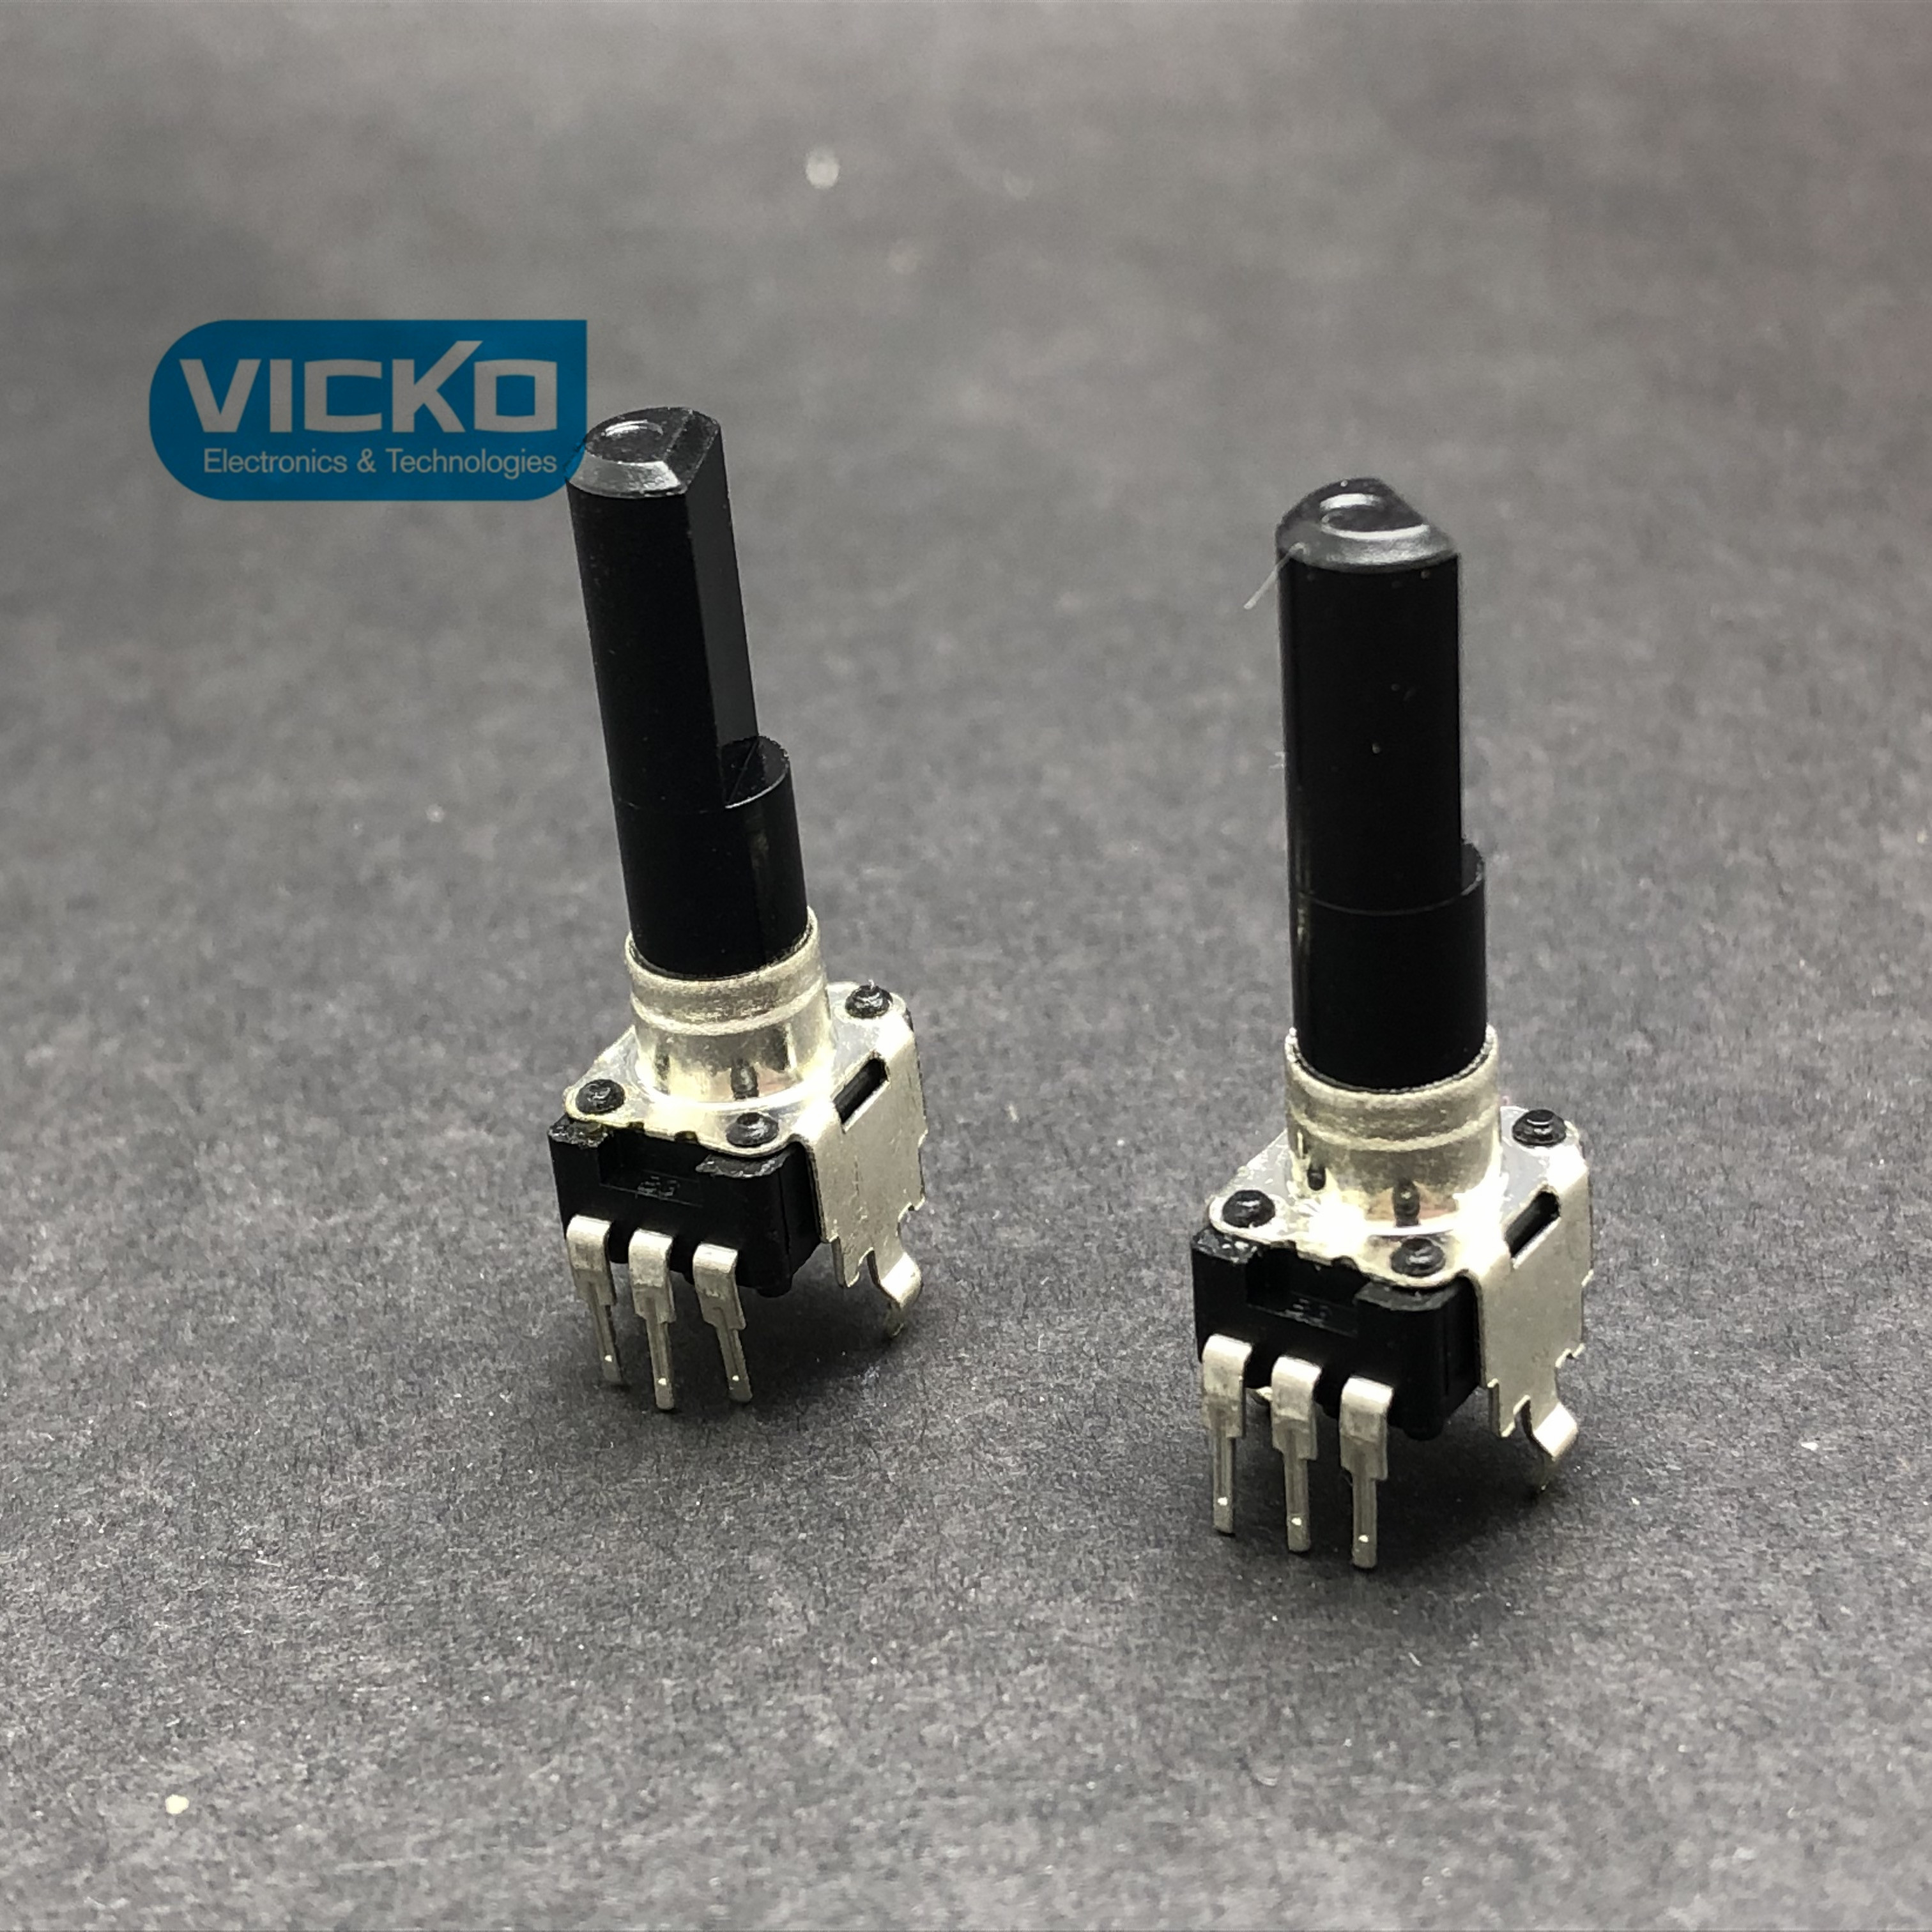 vk RK09 B5K 5K Taiwan Fuhua Mixer Potentiometer Single With Midpoint shaft 23MM Switch B502